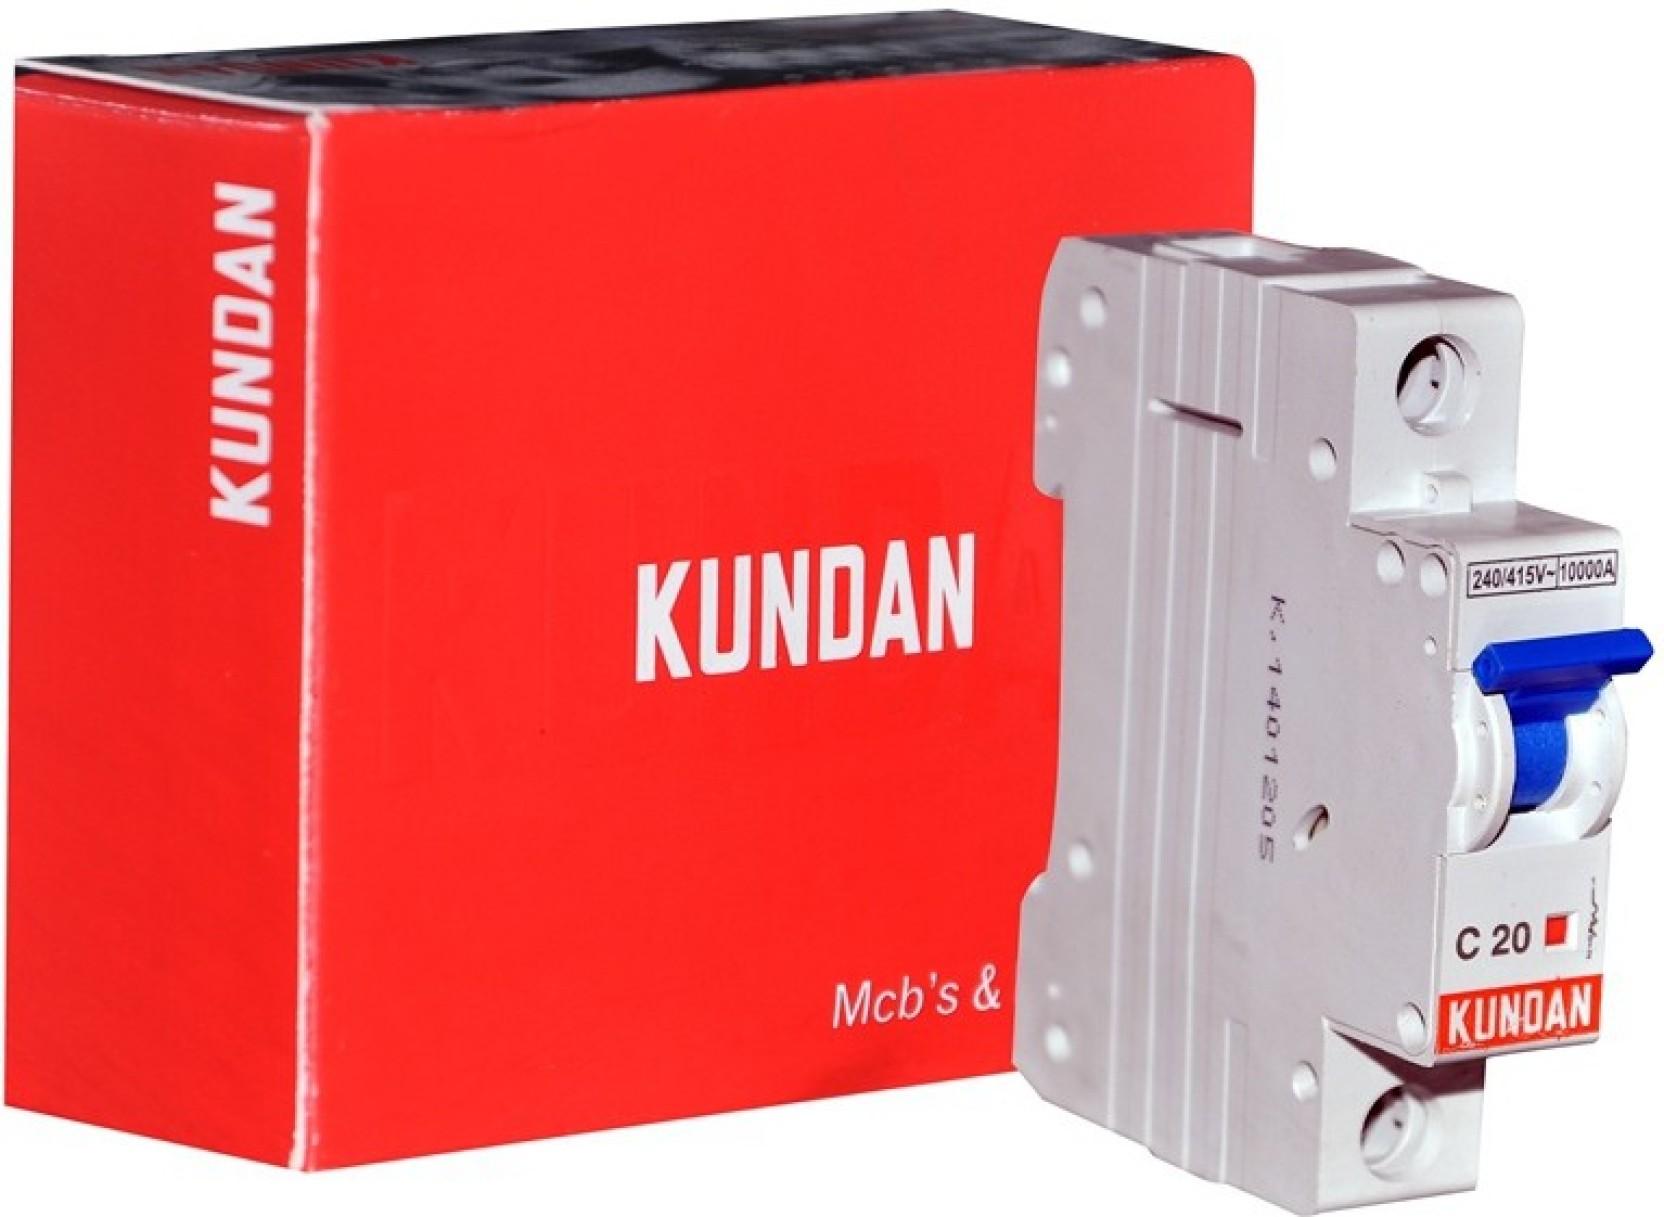 Kundan Cab Single Pole K502 20a Mcb Price In India Buy A9f54132 1 Miniature Circuit Breaker 32a Type C Curve Share